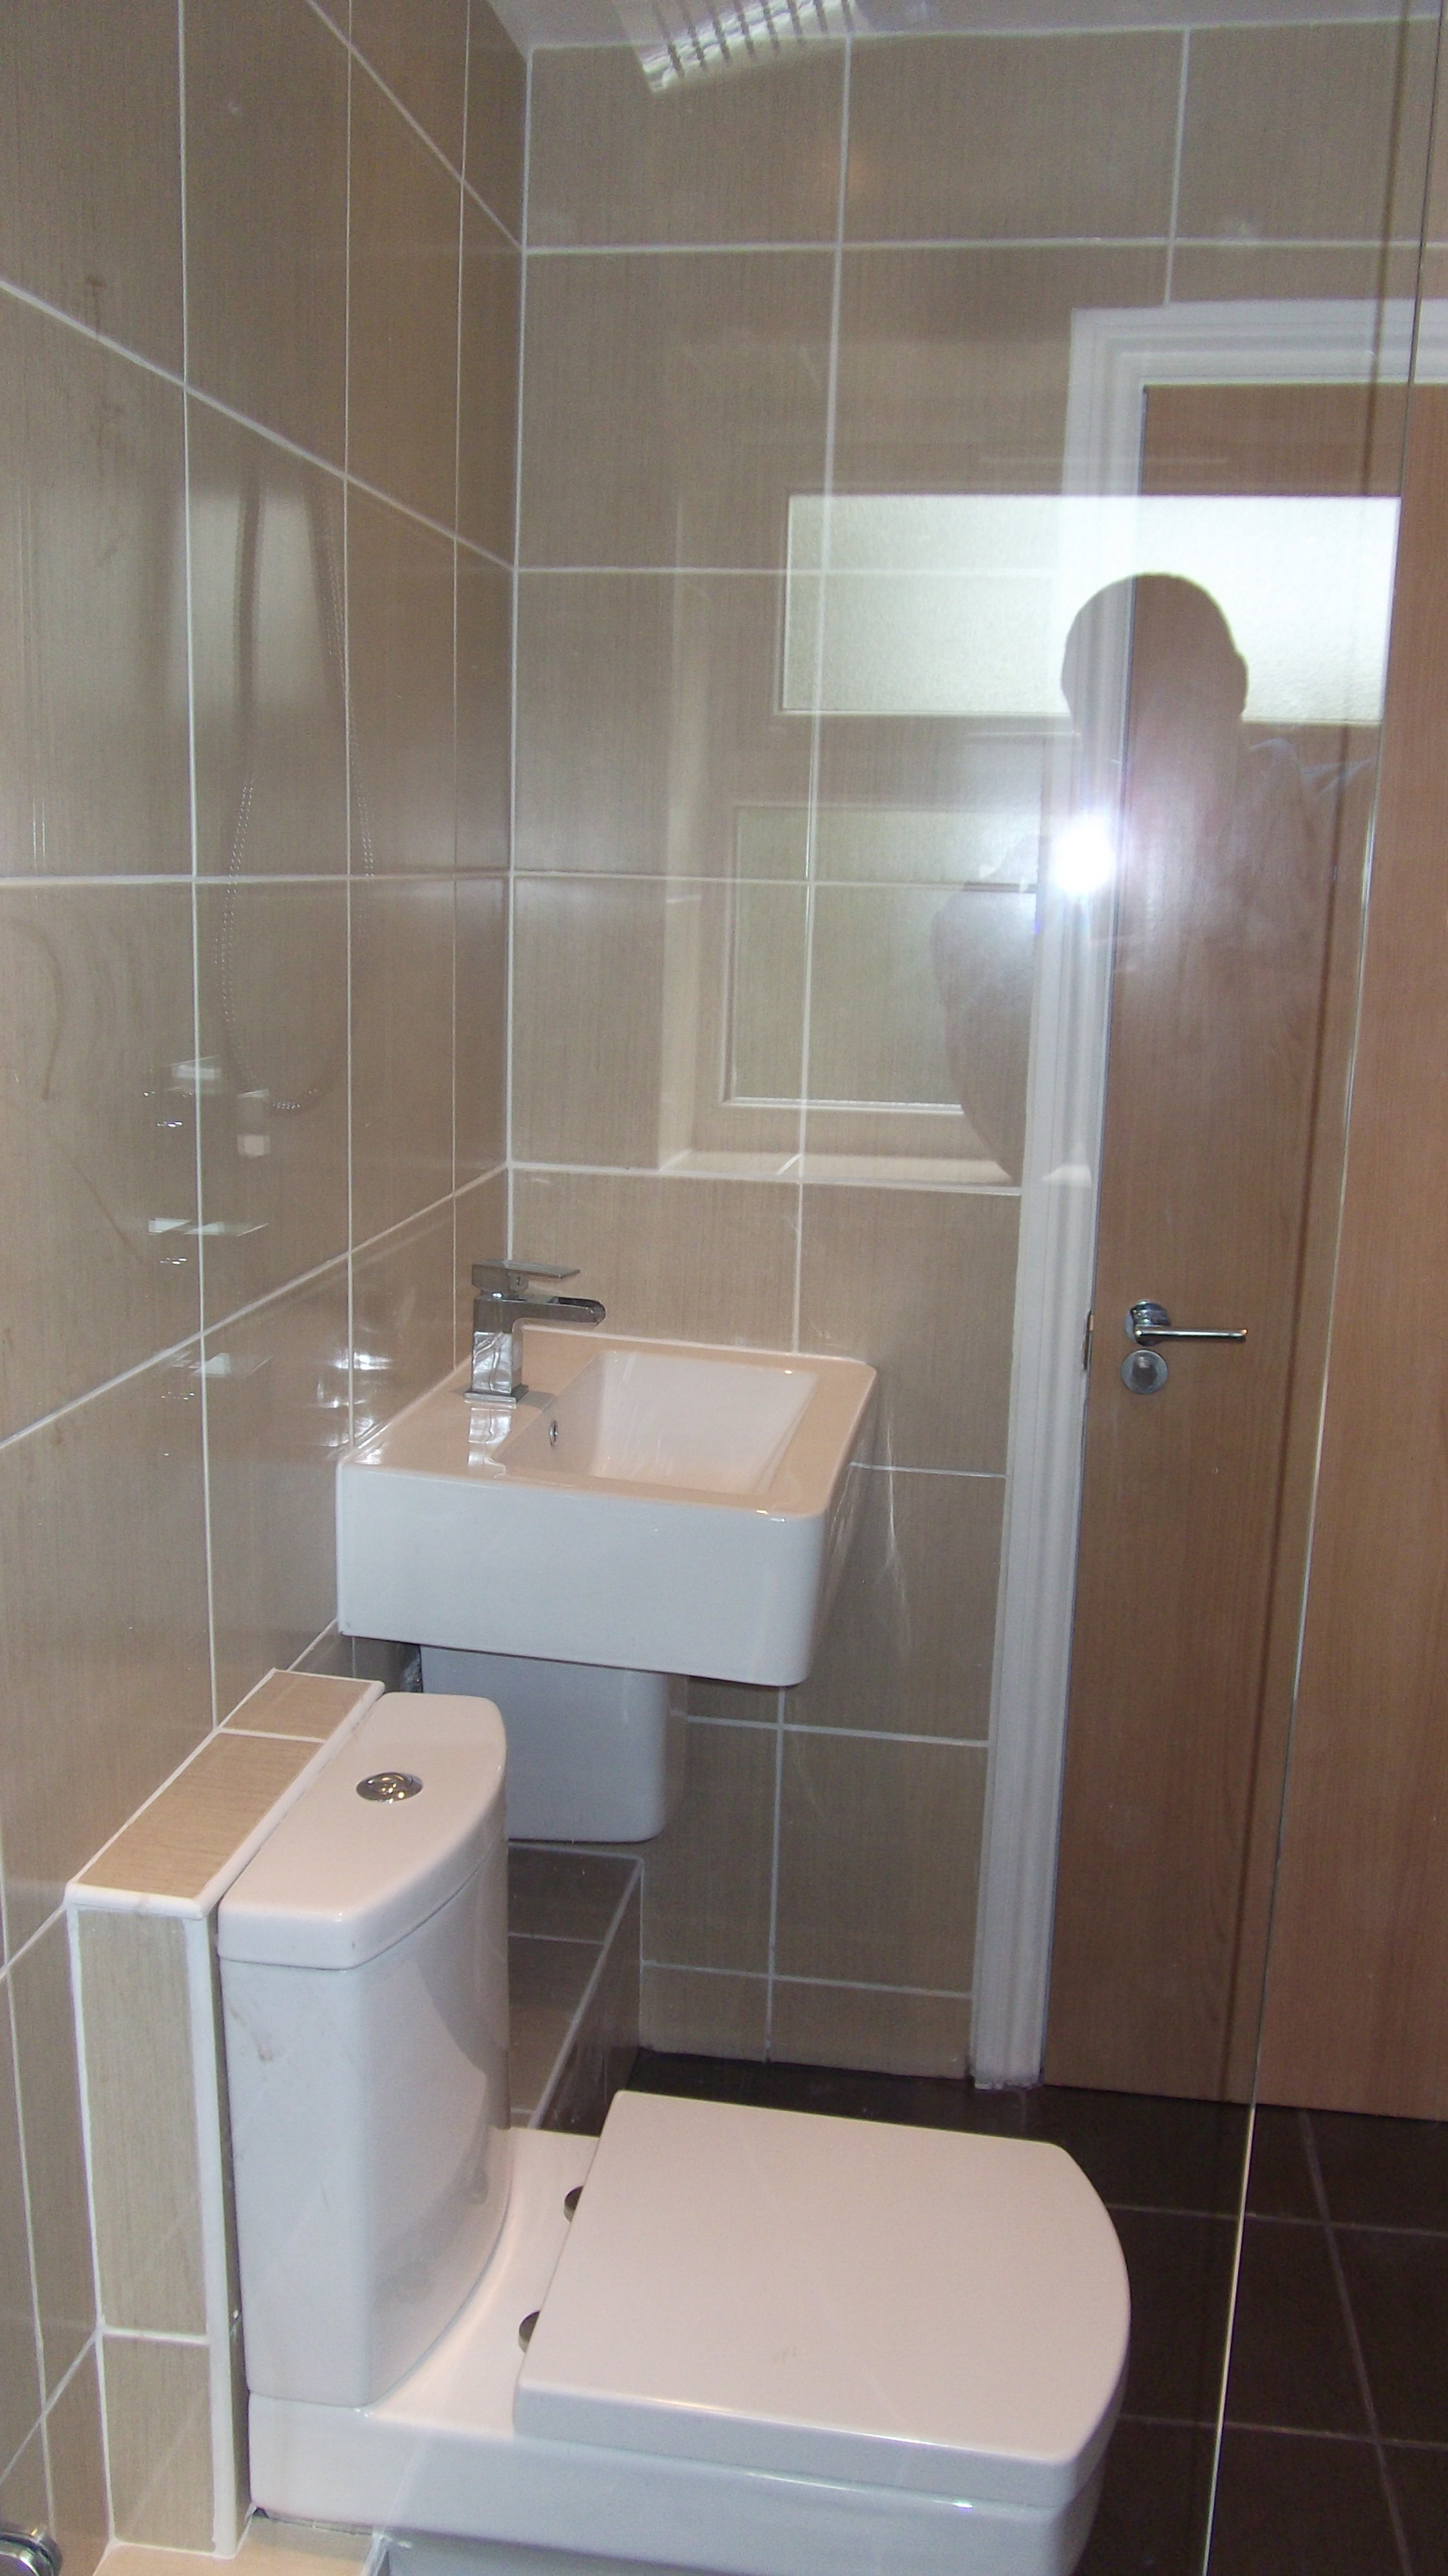 completed refurbished bathroom